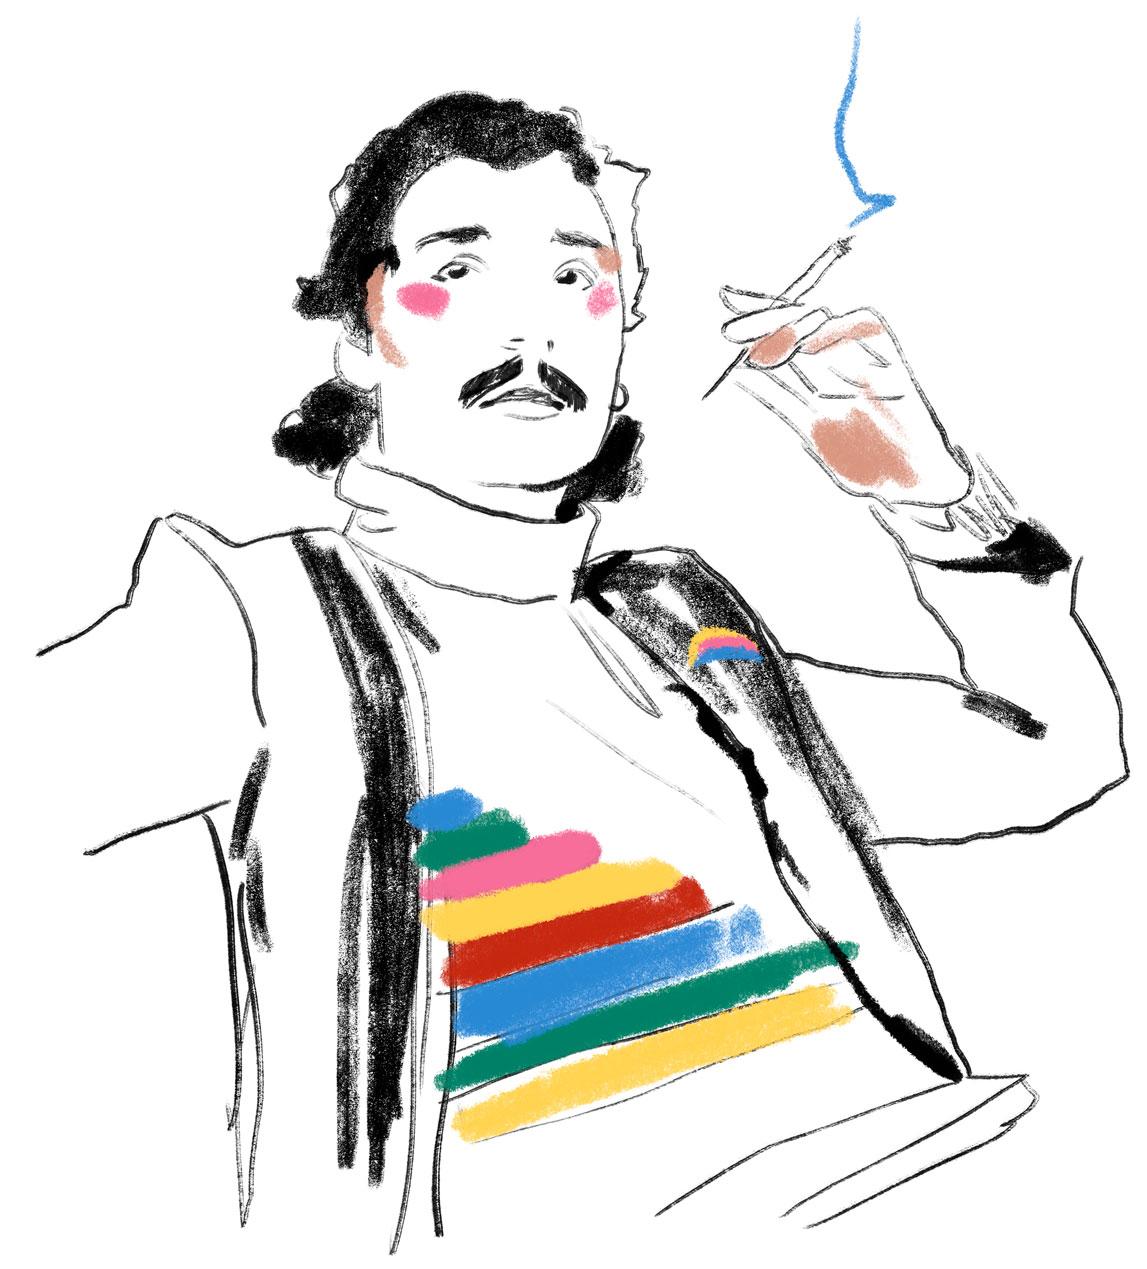 Portrait Illustration des Modeillustrators Antonio Lopez mit regenbogen Farben und buntem t-shirt print